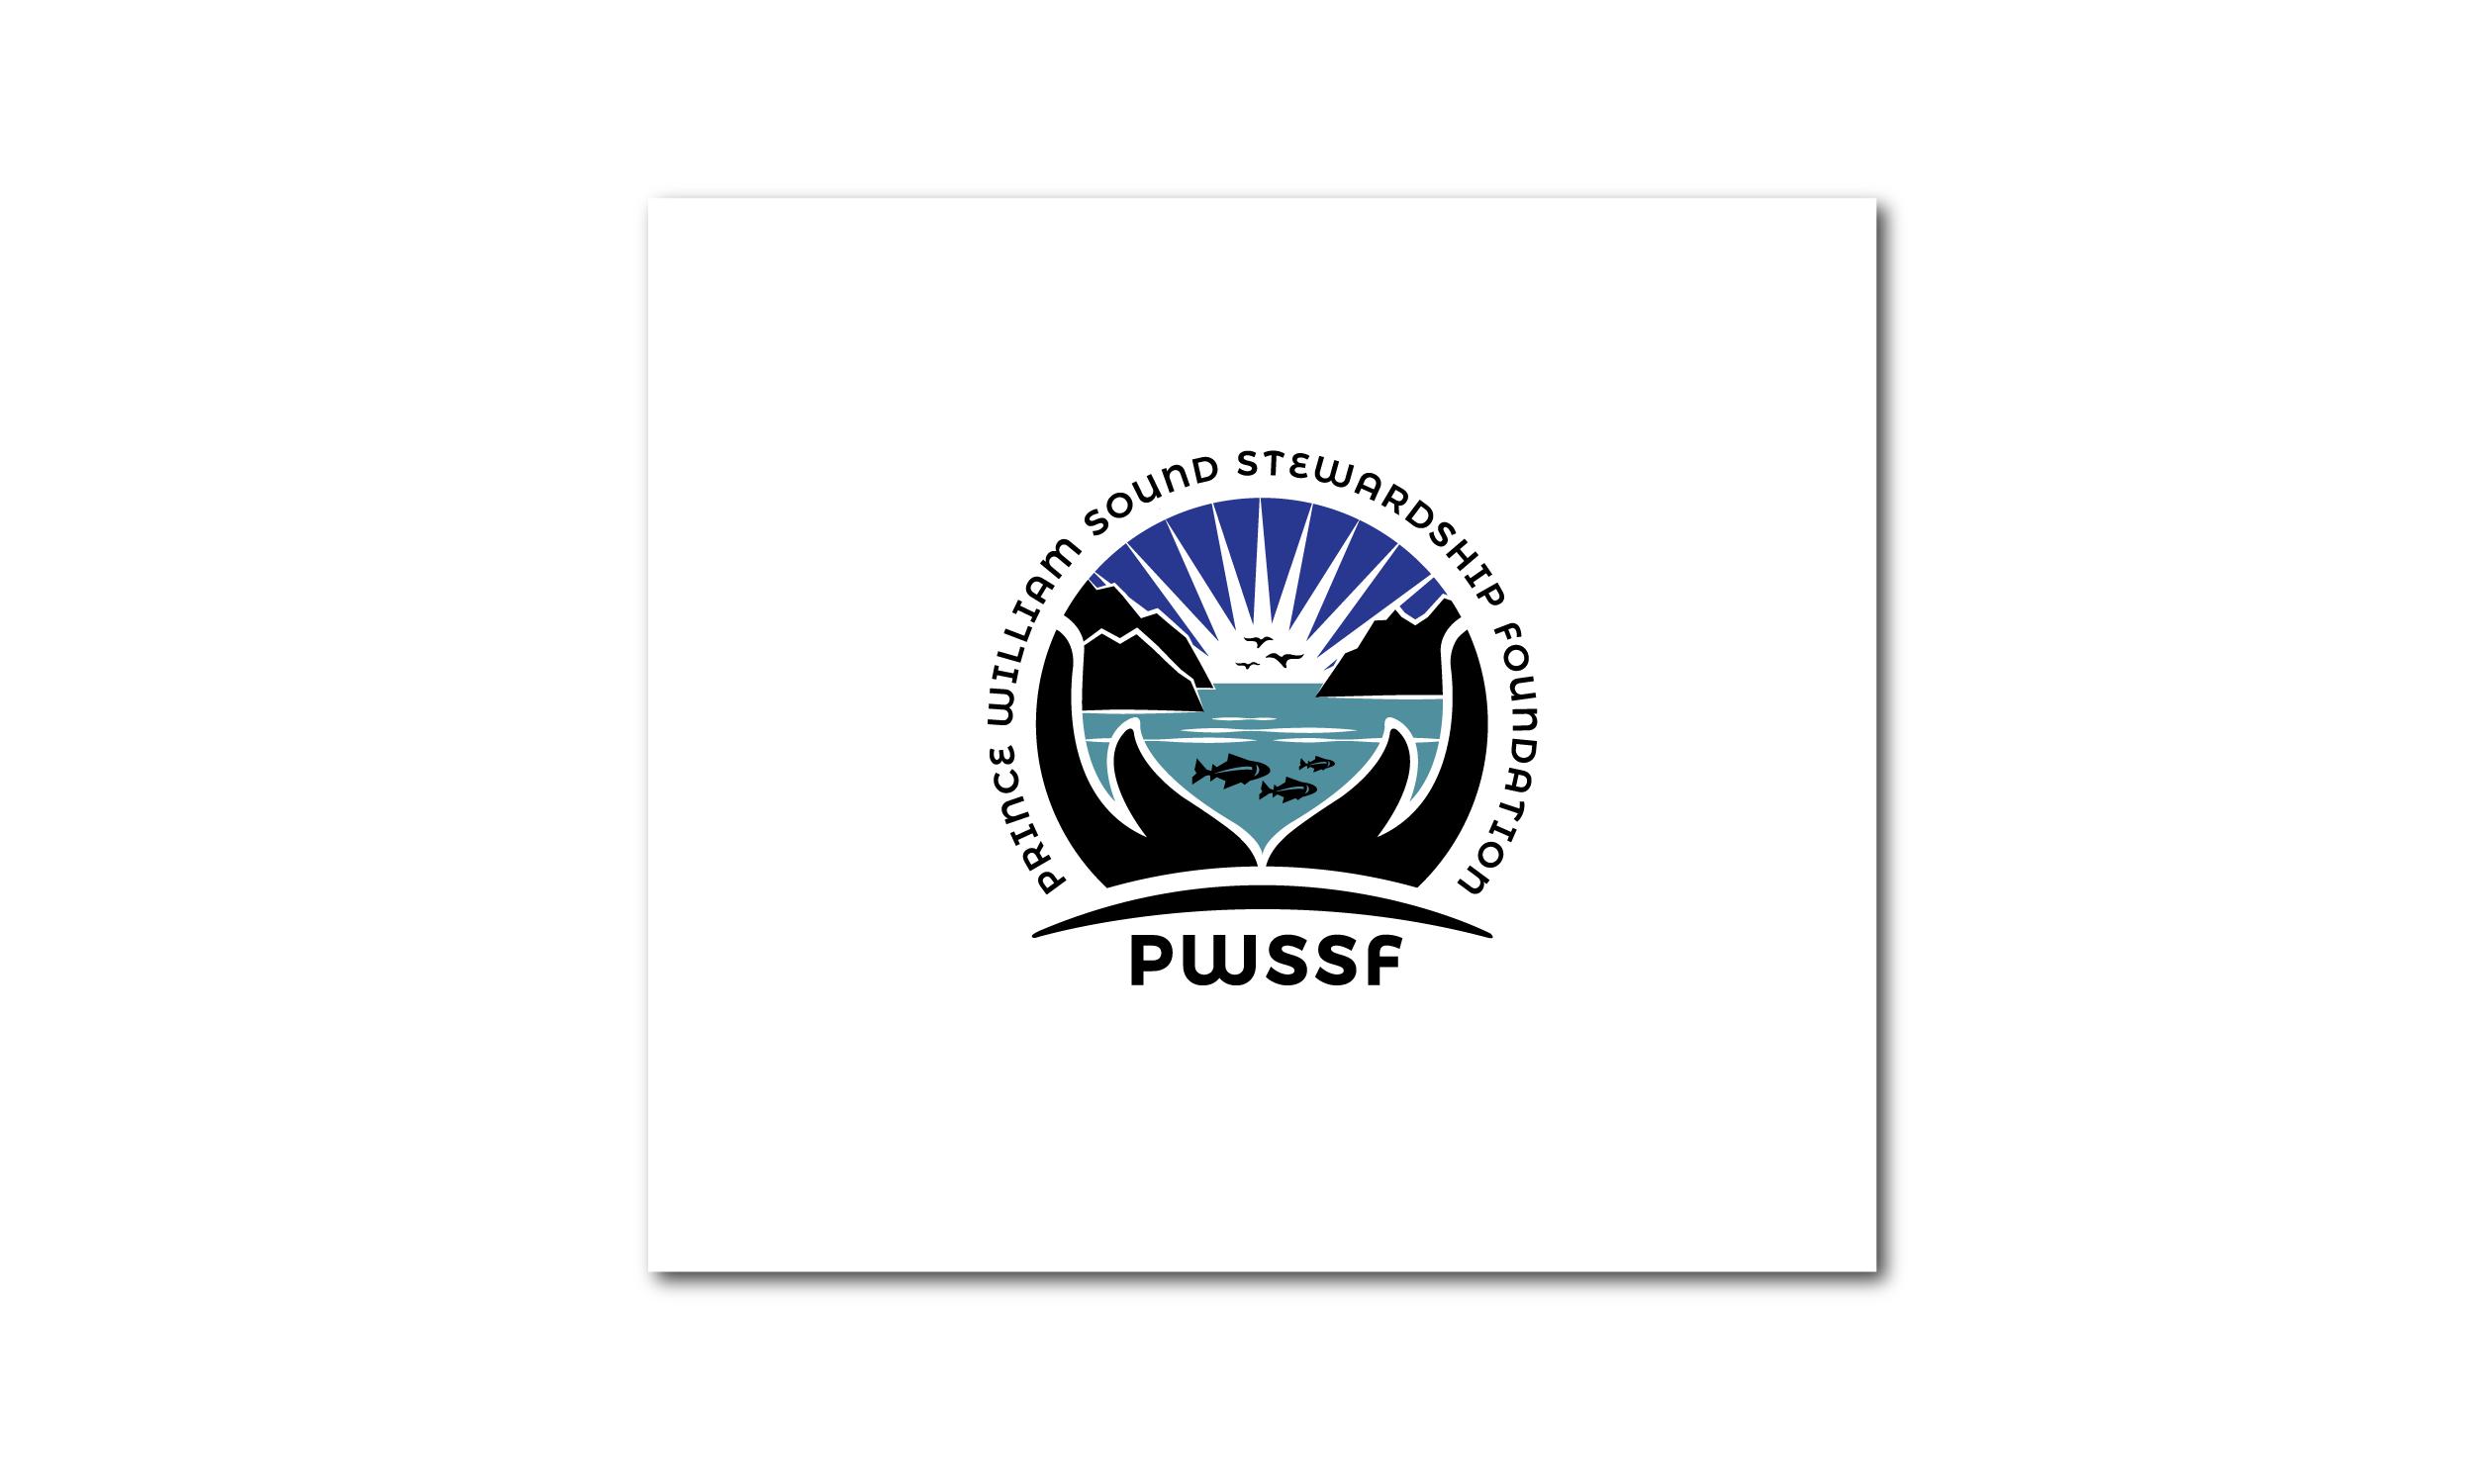 Prince William Sound Stewardship Foundation